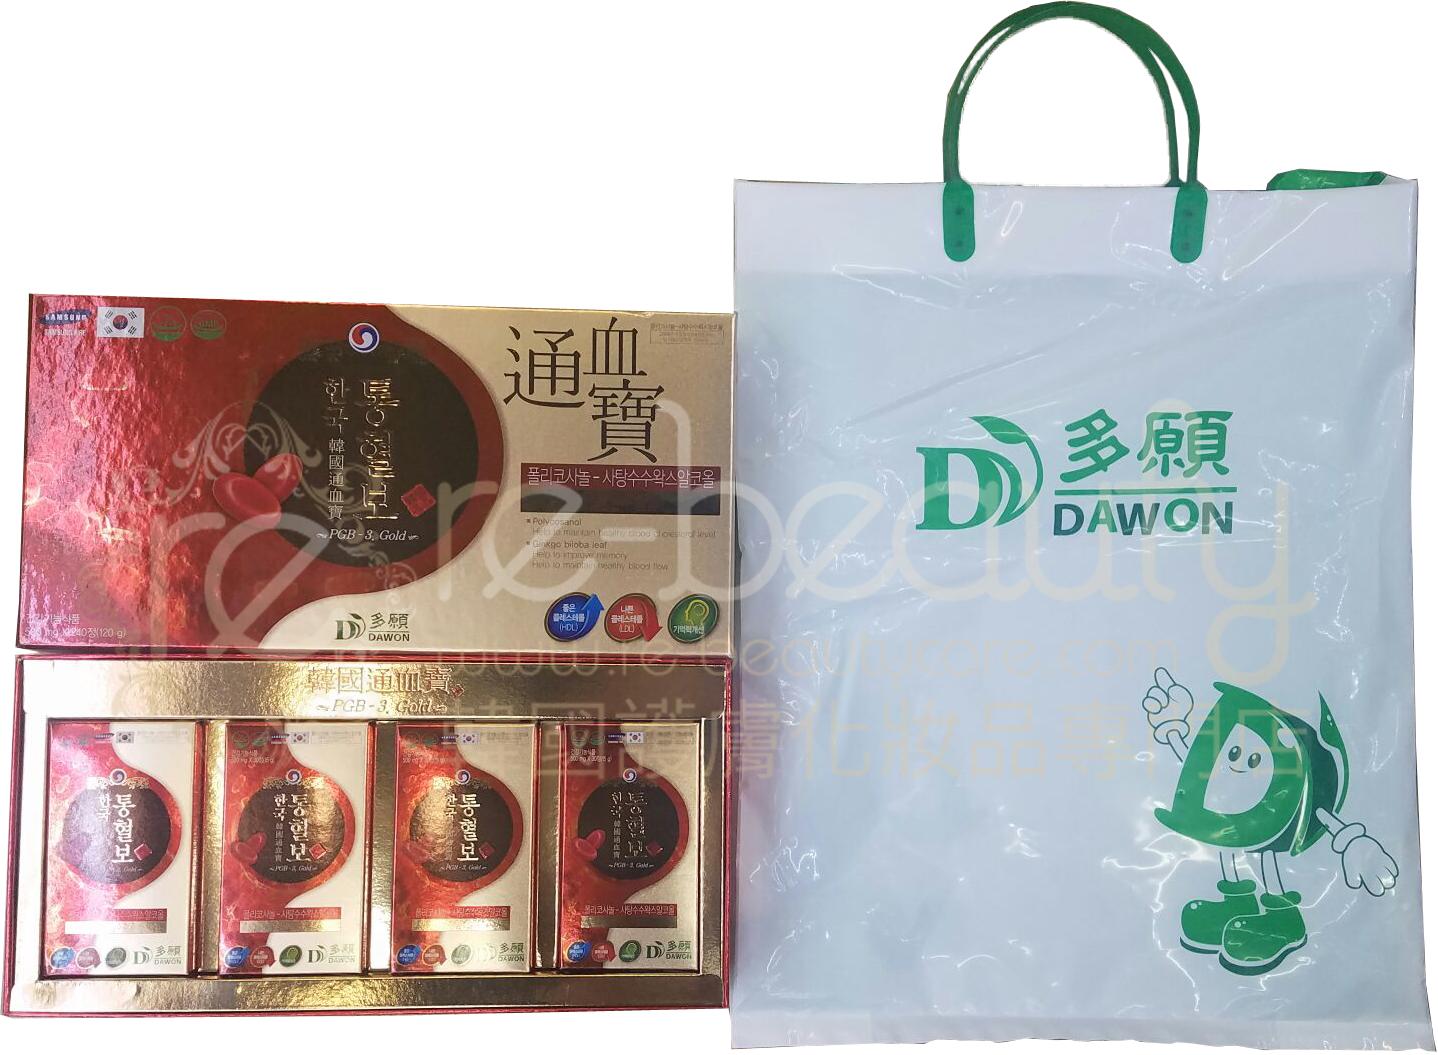 dawon-pgb-240.png